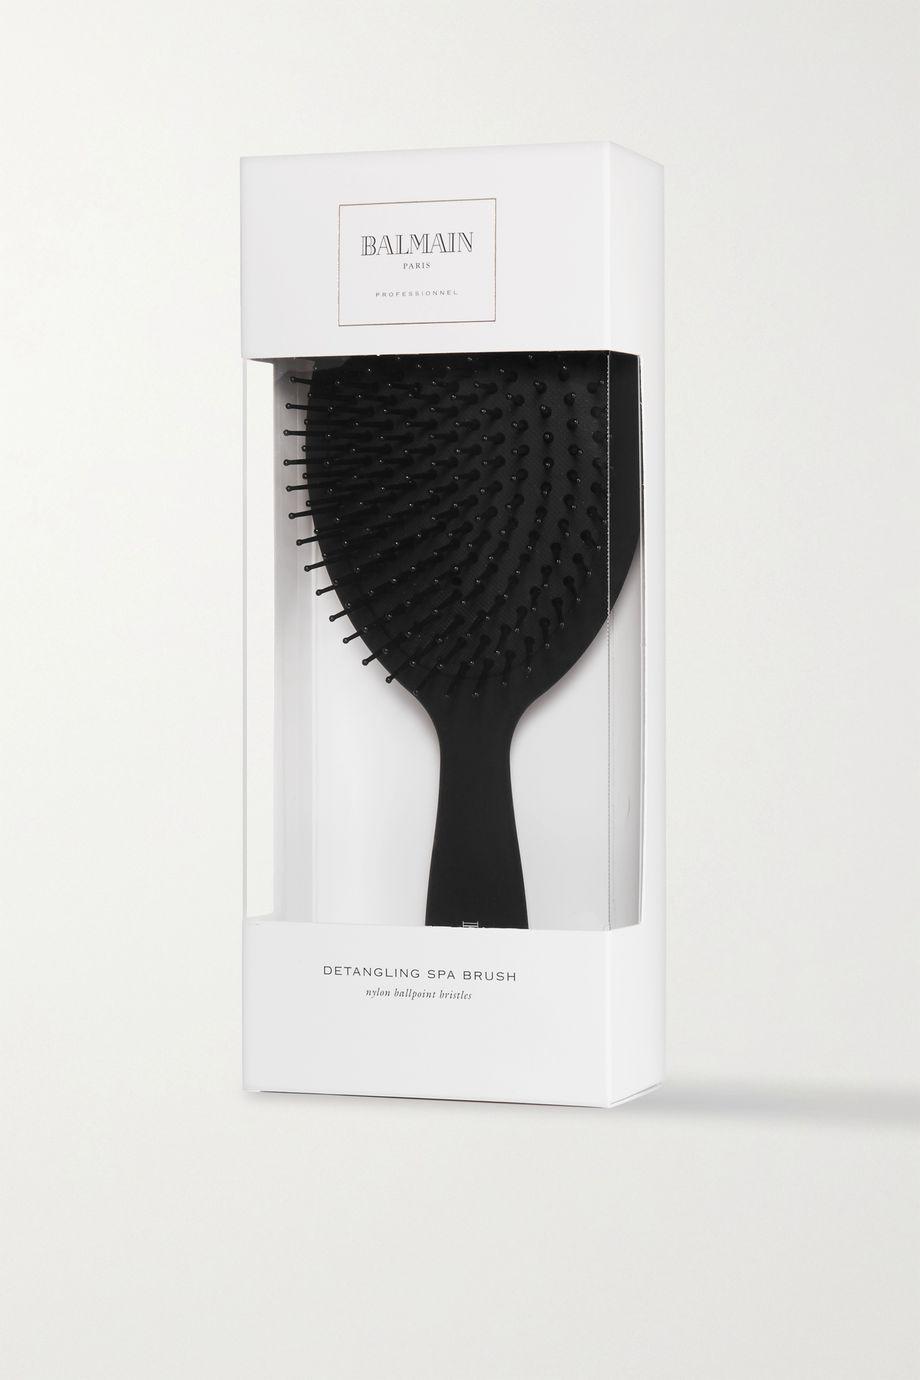 Balmain Paris Hair Couture Detangling Spa Brush